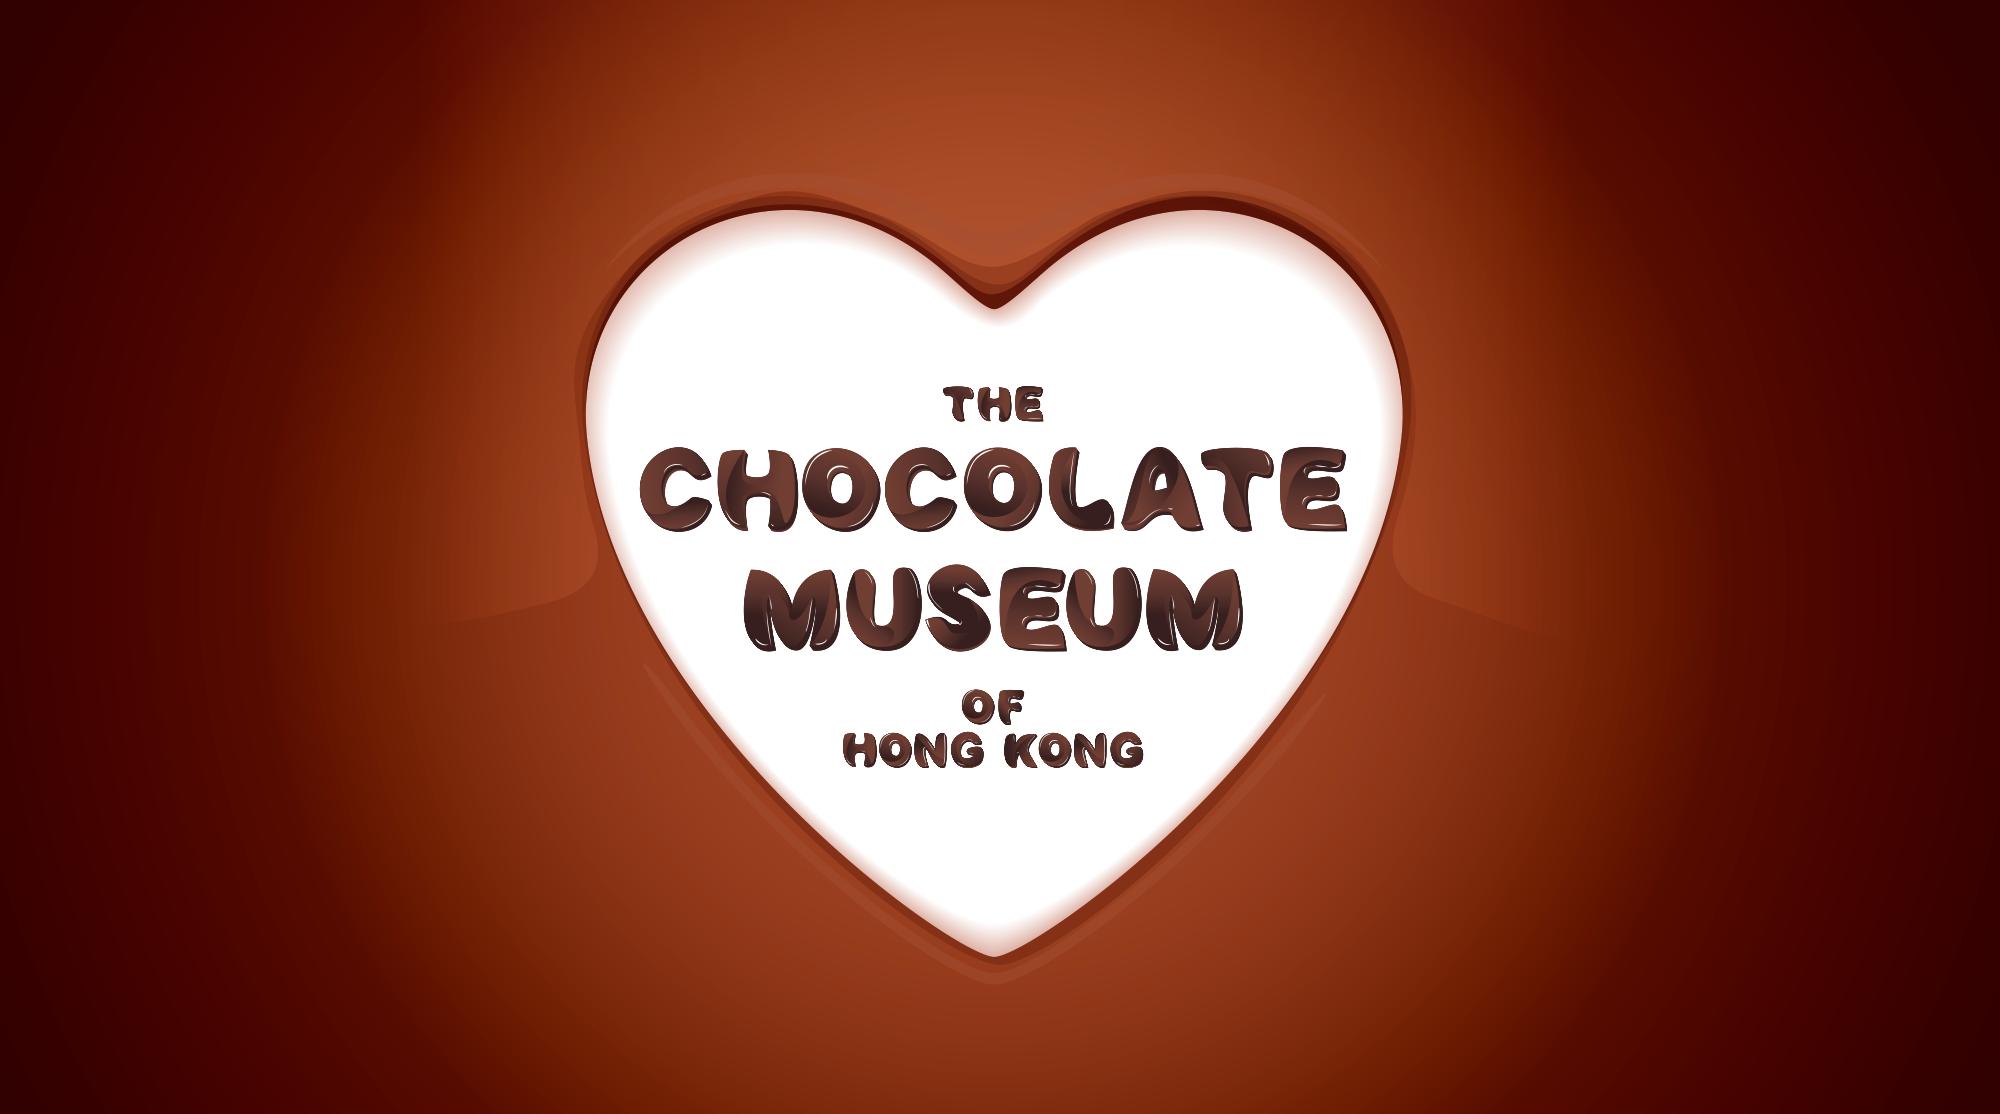 The Chocolate Museum of Hong Kong (已搬遷)